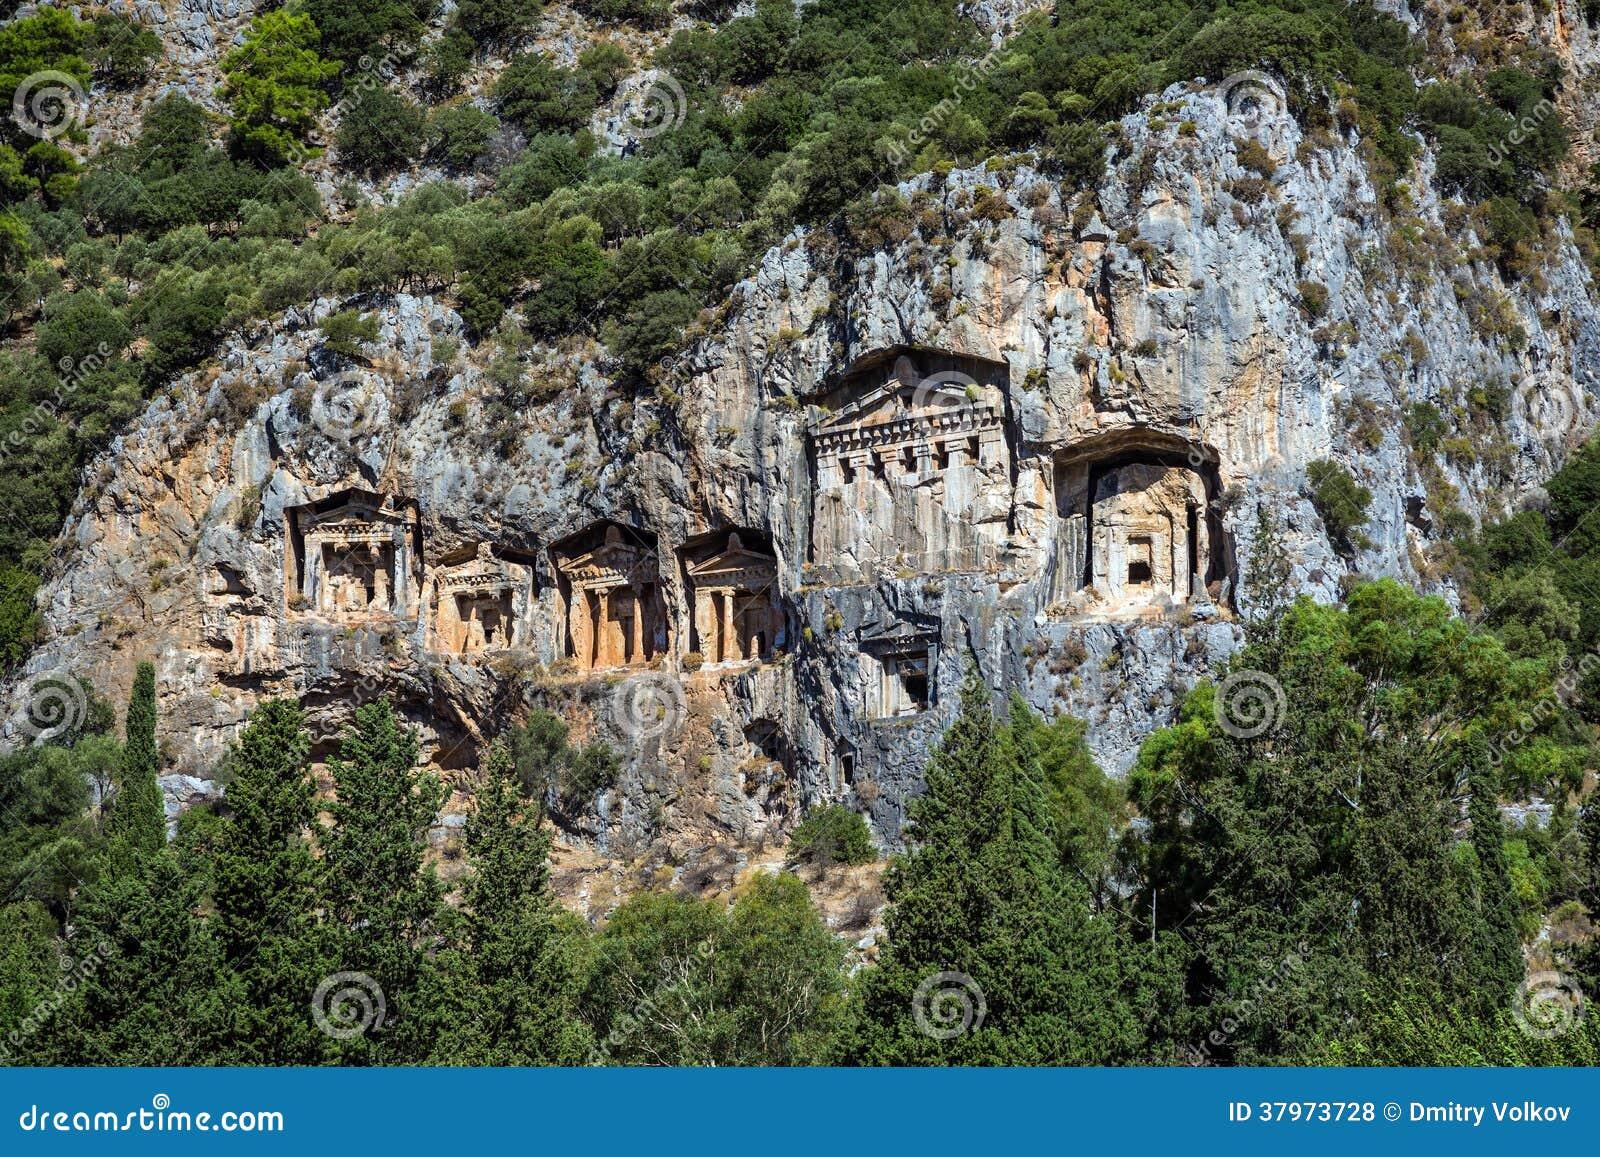 Dalyan Turkey  city images : Cave tombs of Kaunos near Dalyan, Turkey.